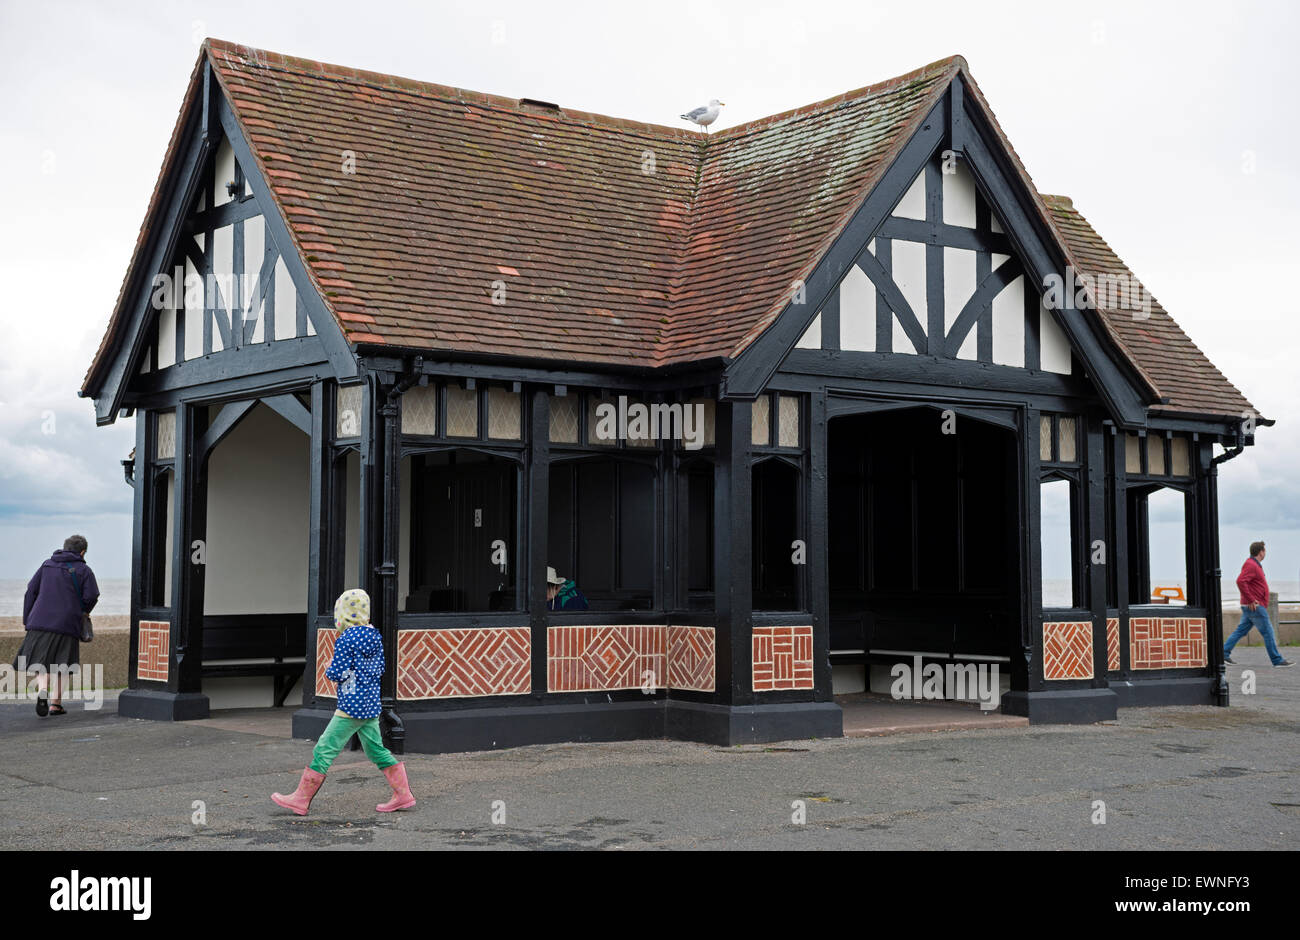 Historic wood framed shelter and public toilets, Aldeburgh, Suffolk, UK. - Stock Image